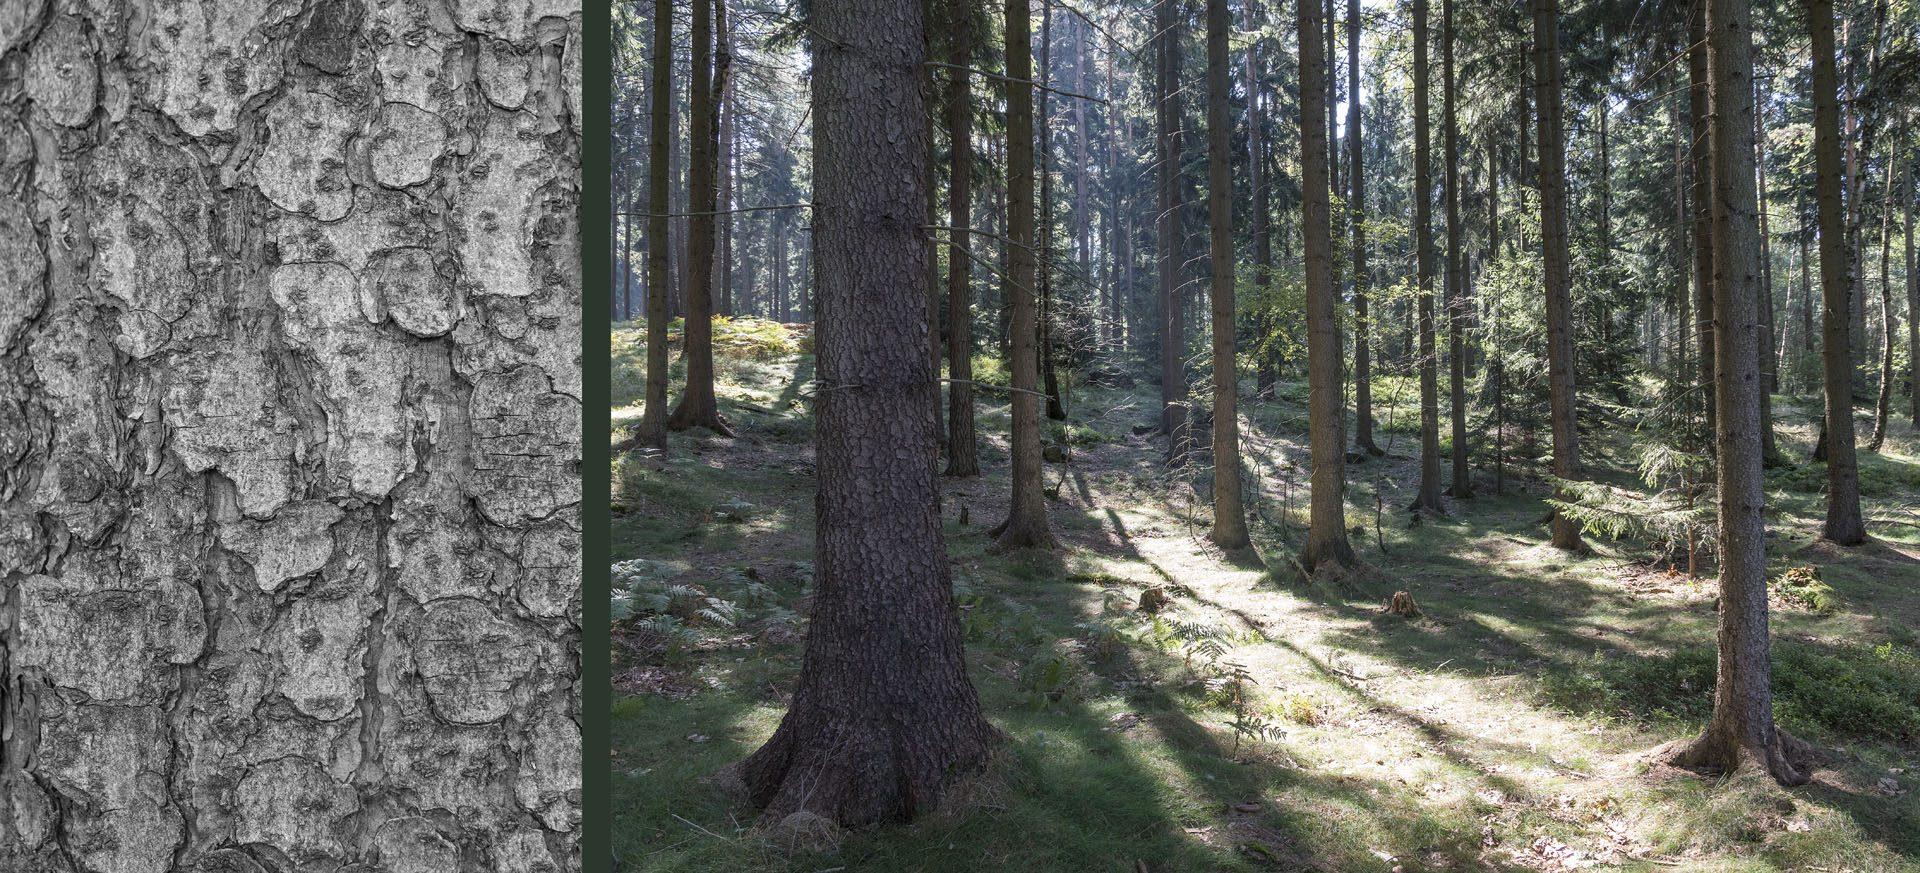 WaldRindenDoppel Tannen III • Lambda-Print auf KODAK Pro Endura, Alu-Dibond®, 110 x 50 cm, gerahmt als Art-Box • Auflage: 5 + 2 Artist's Proof